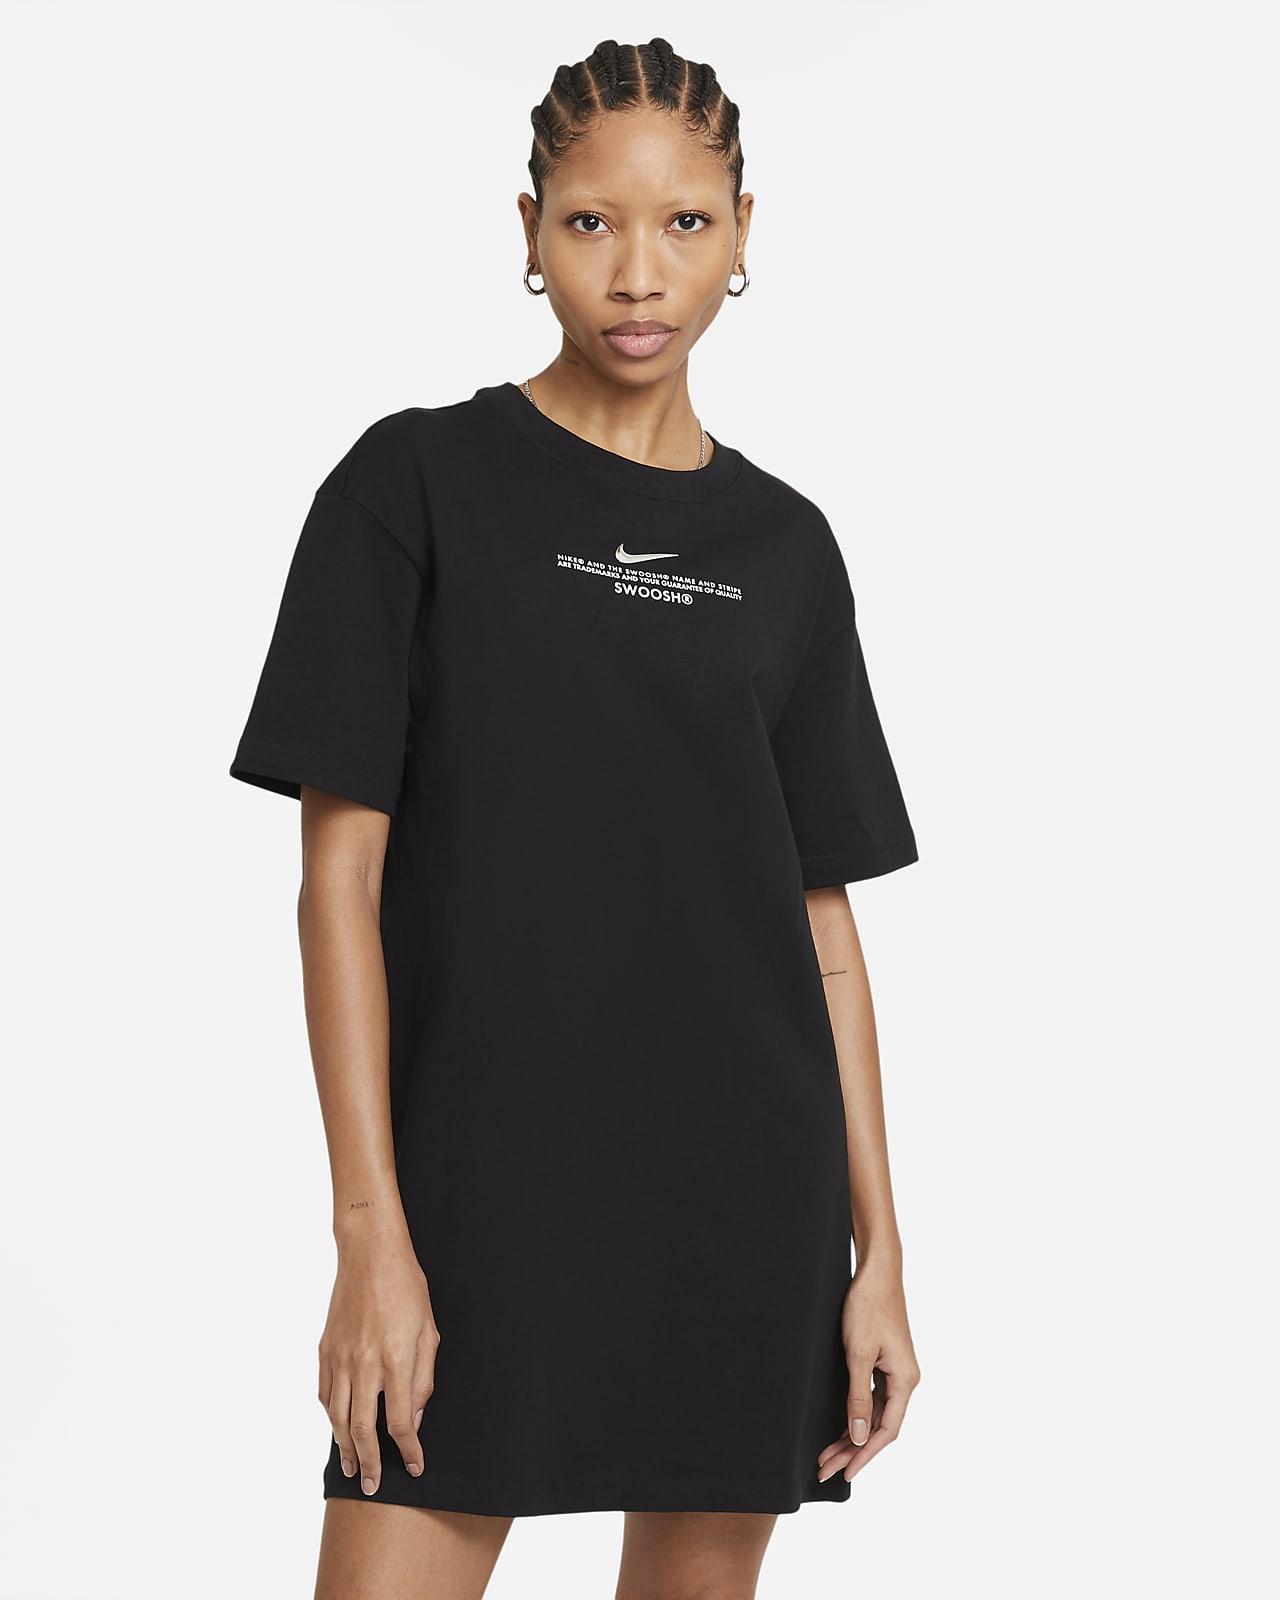 Nike Sportswear Swoosh 女子连衣裙